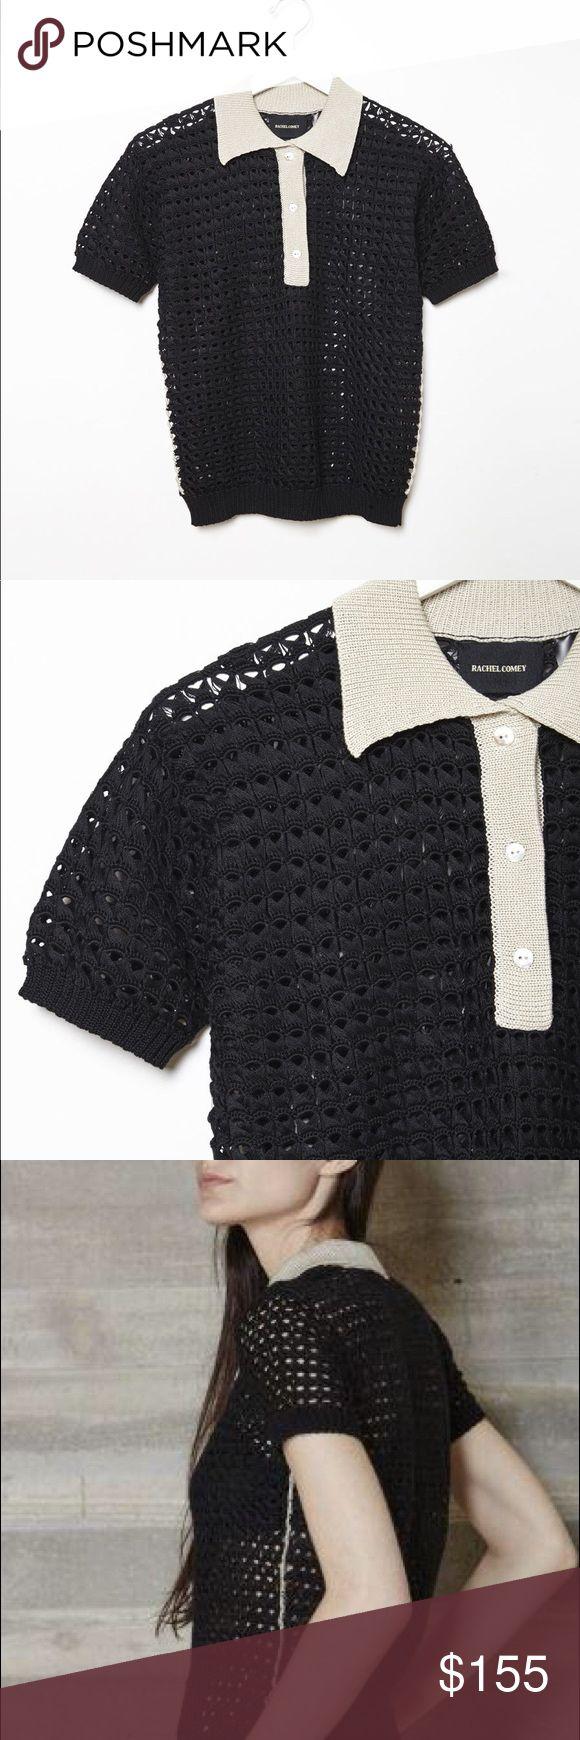 Rachel Comey Crochet Polo Shirt/ Sweater Rachel Comey black sheer crochet polo top with beige collar Rachel Comey Tops Tees - Short Sleeve